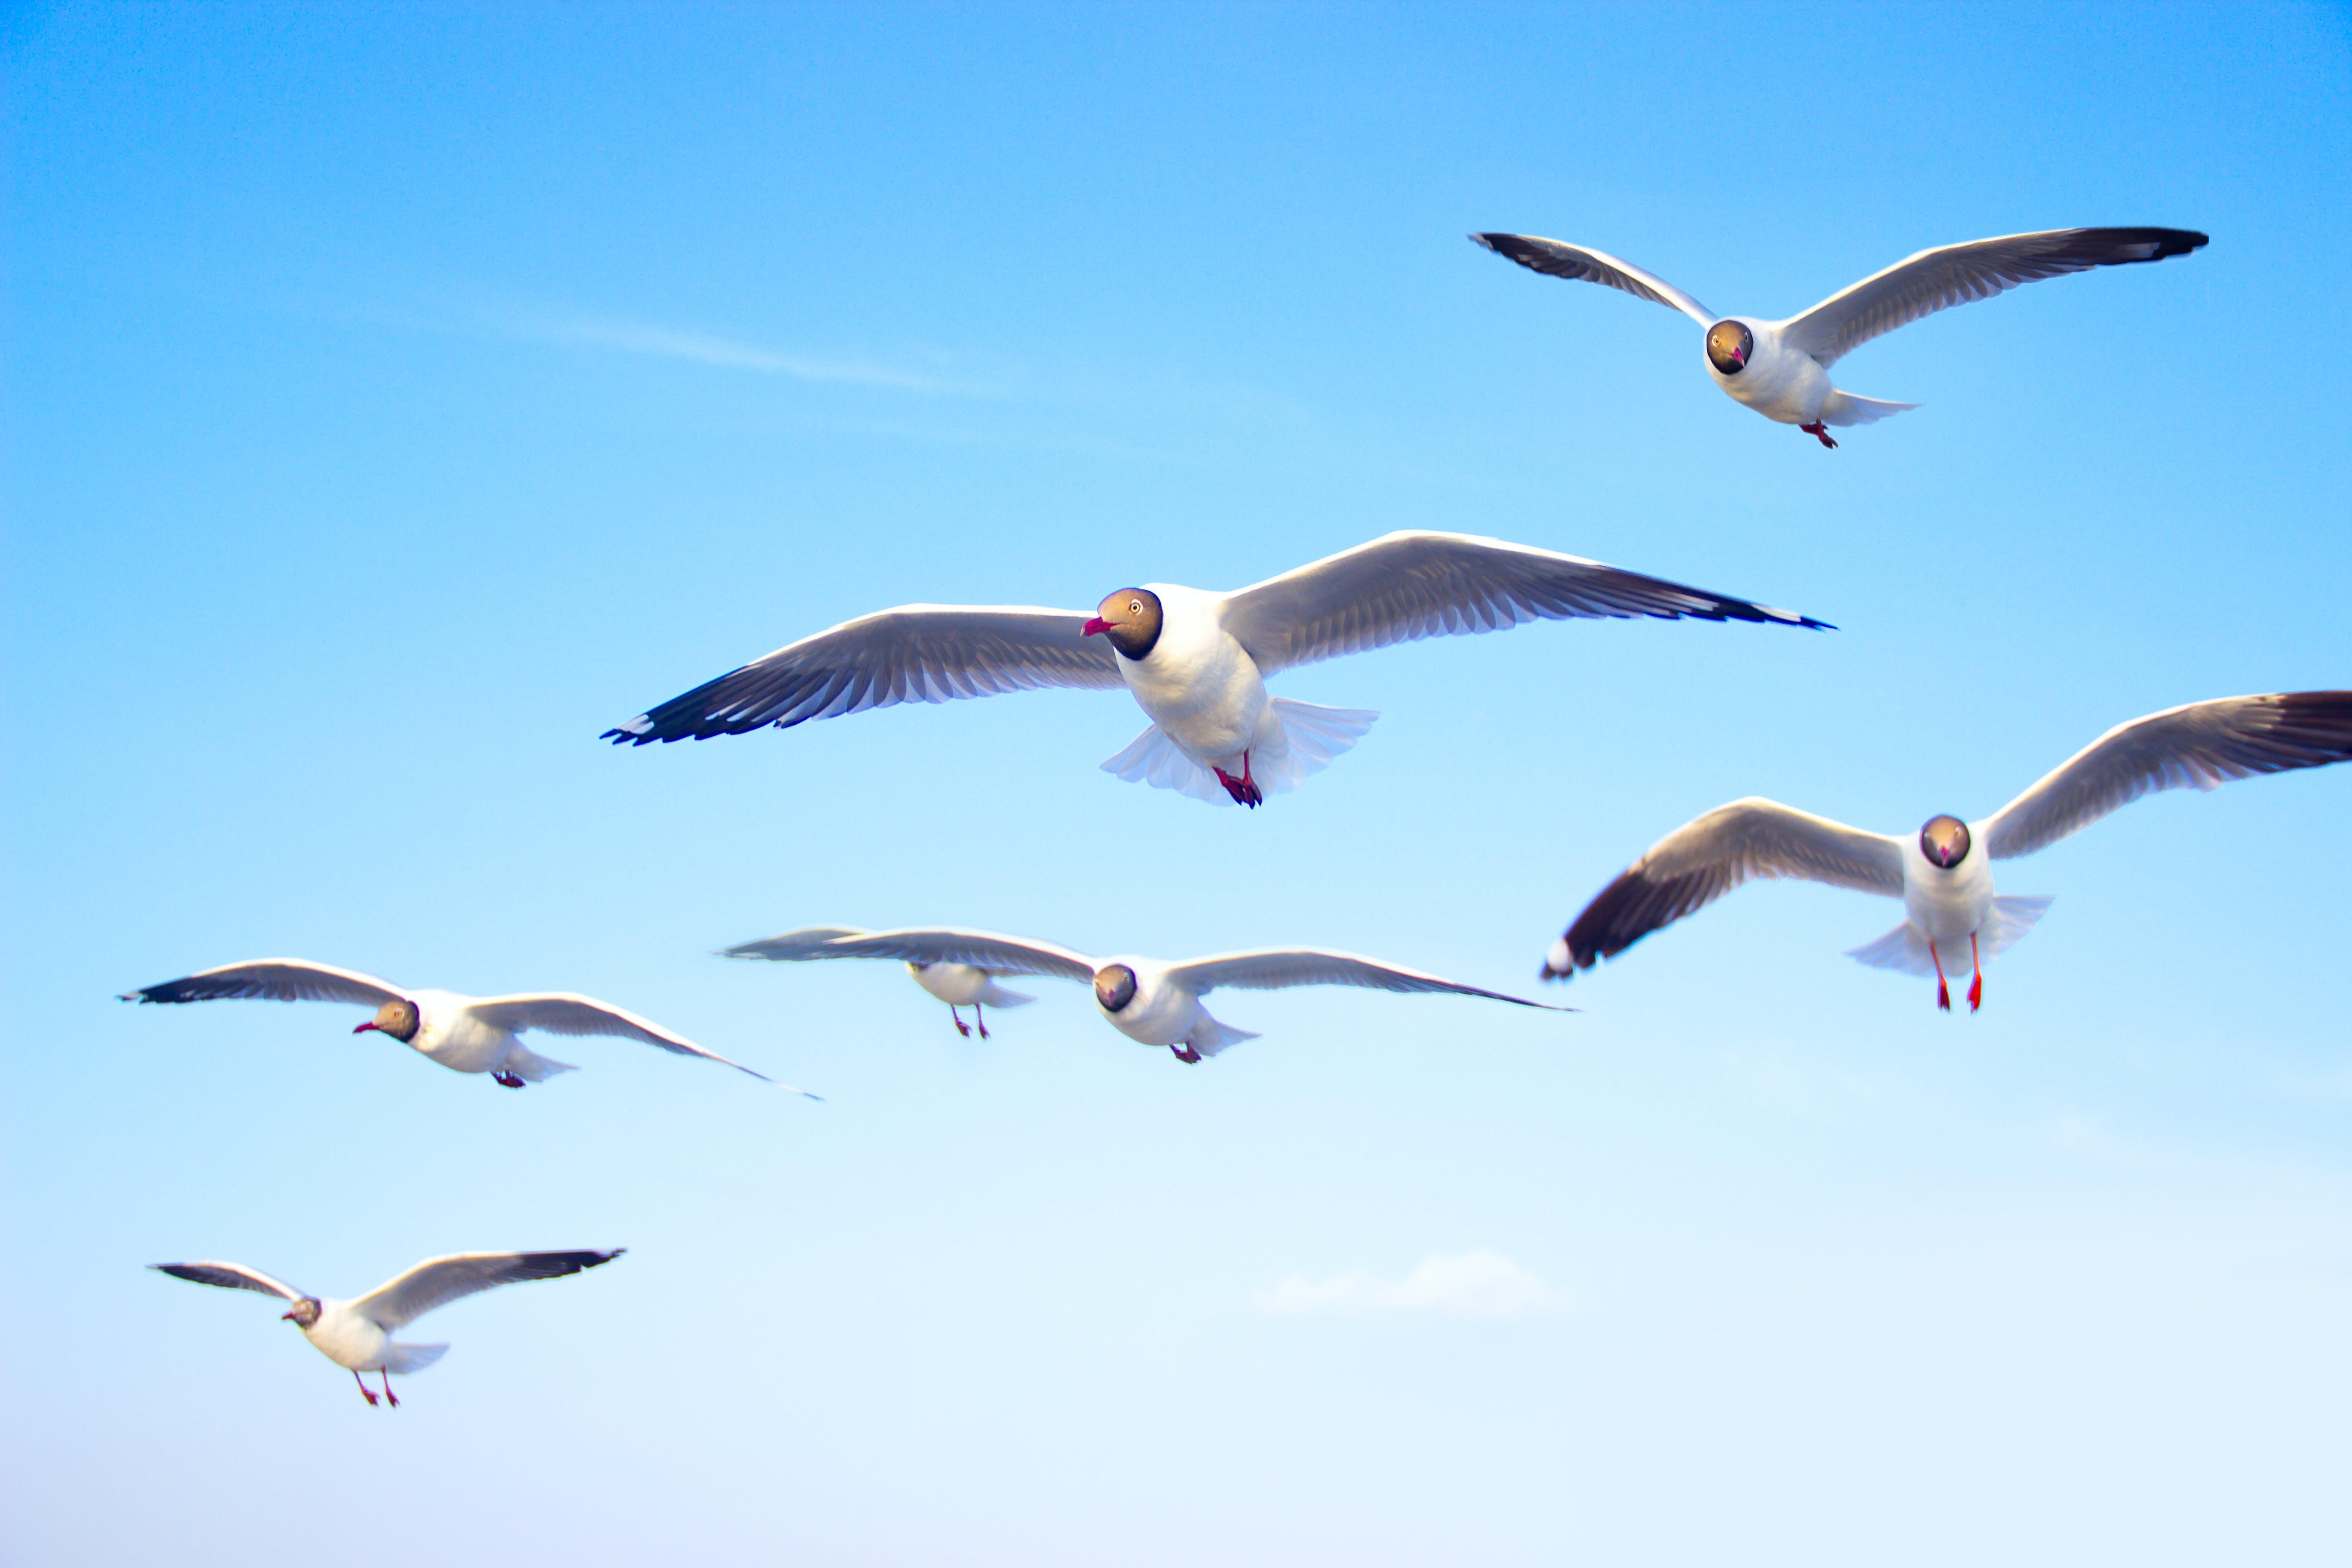 Free stock photo of sky, bird, flying, blue sky